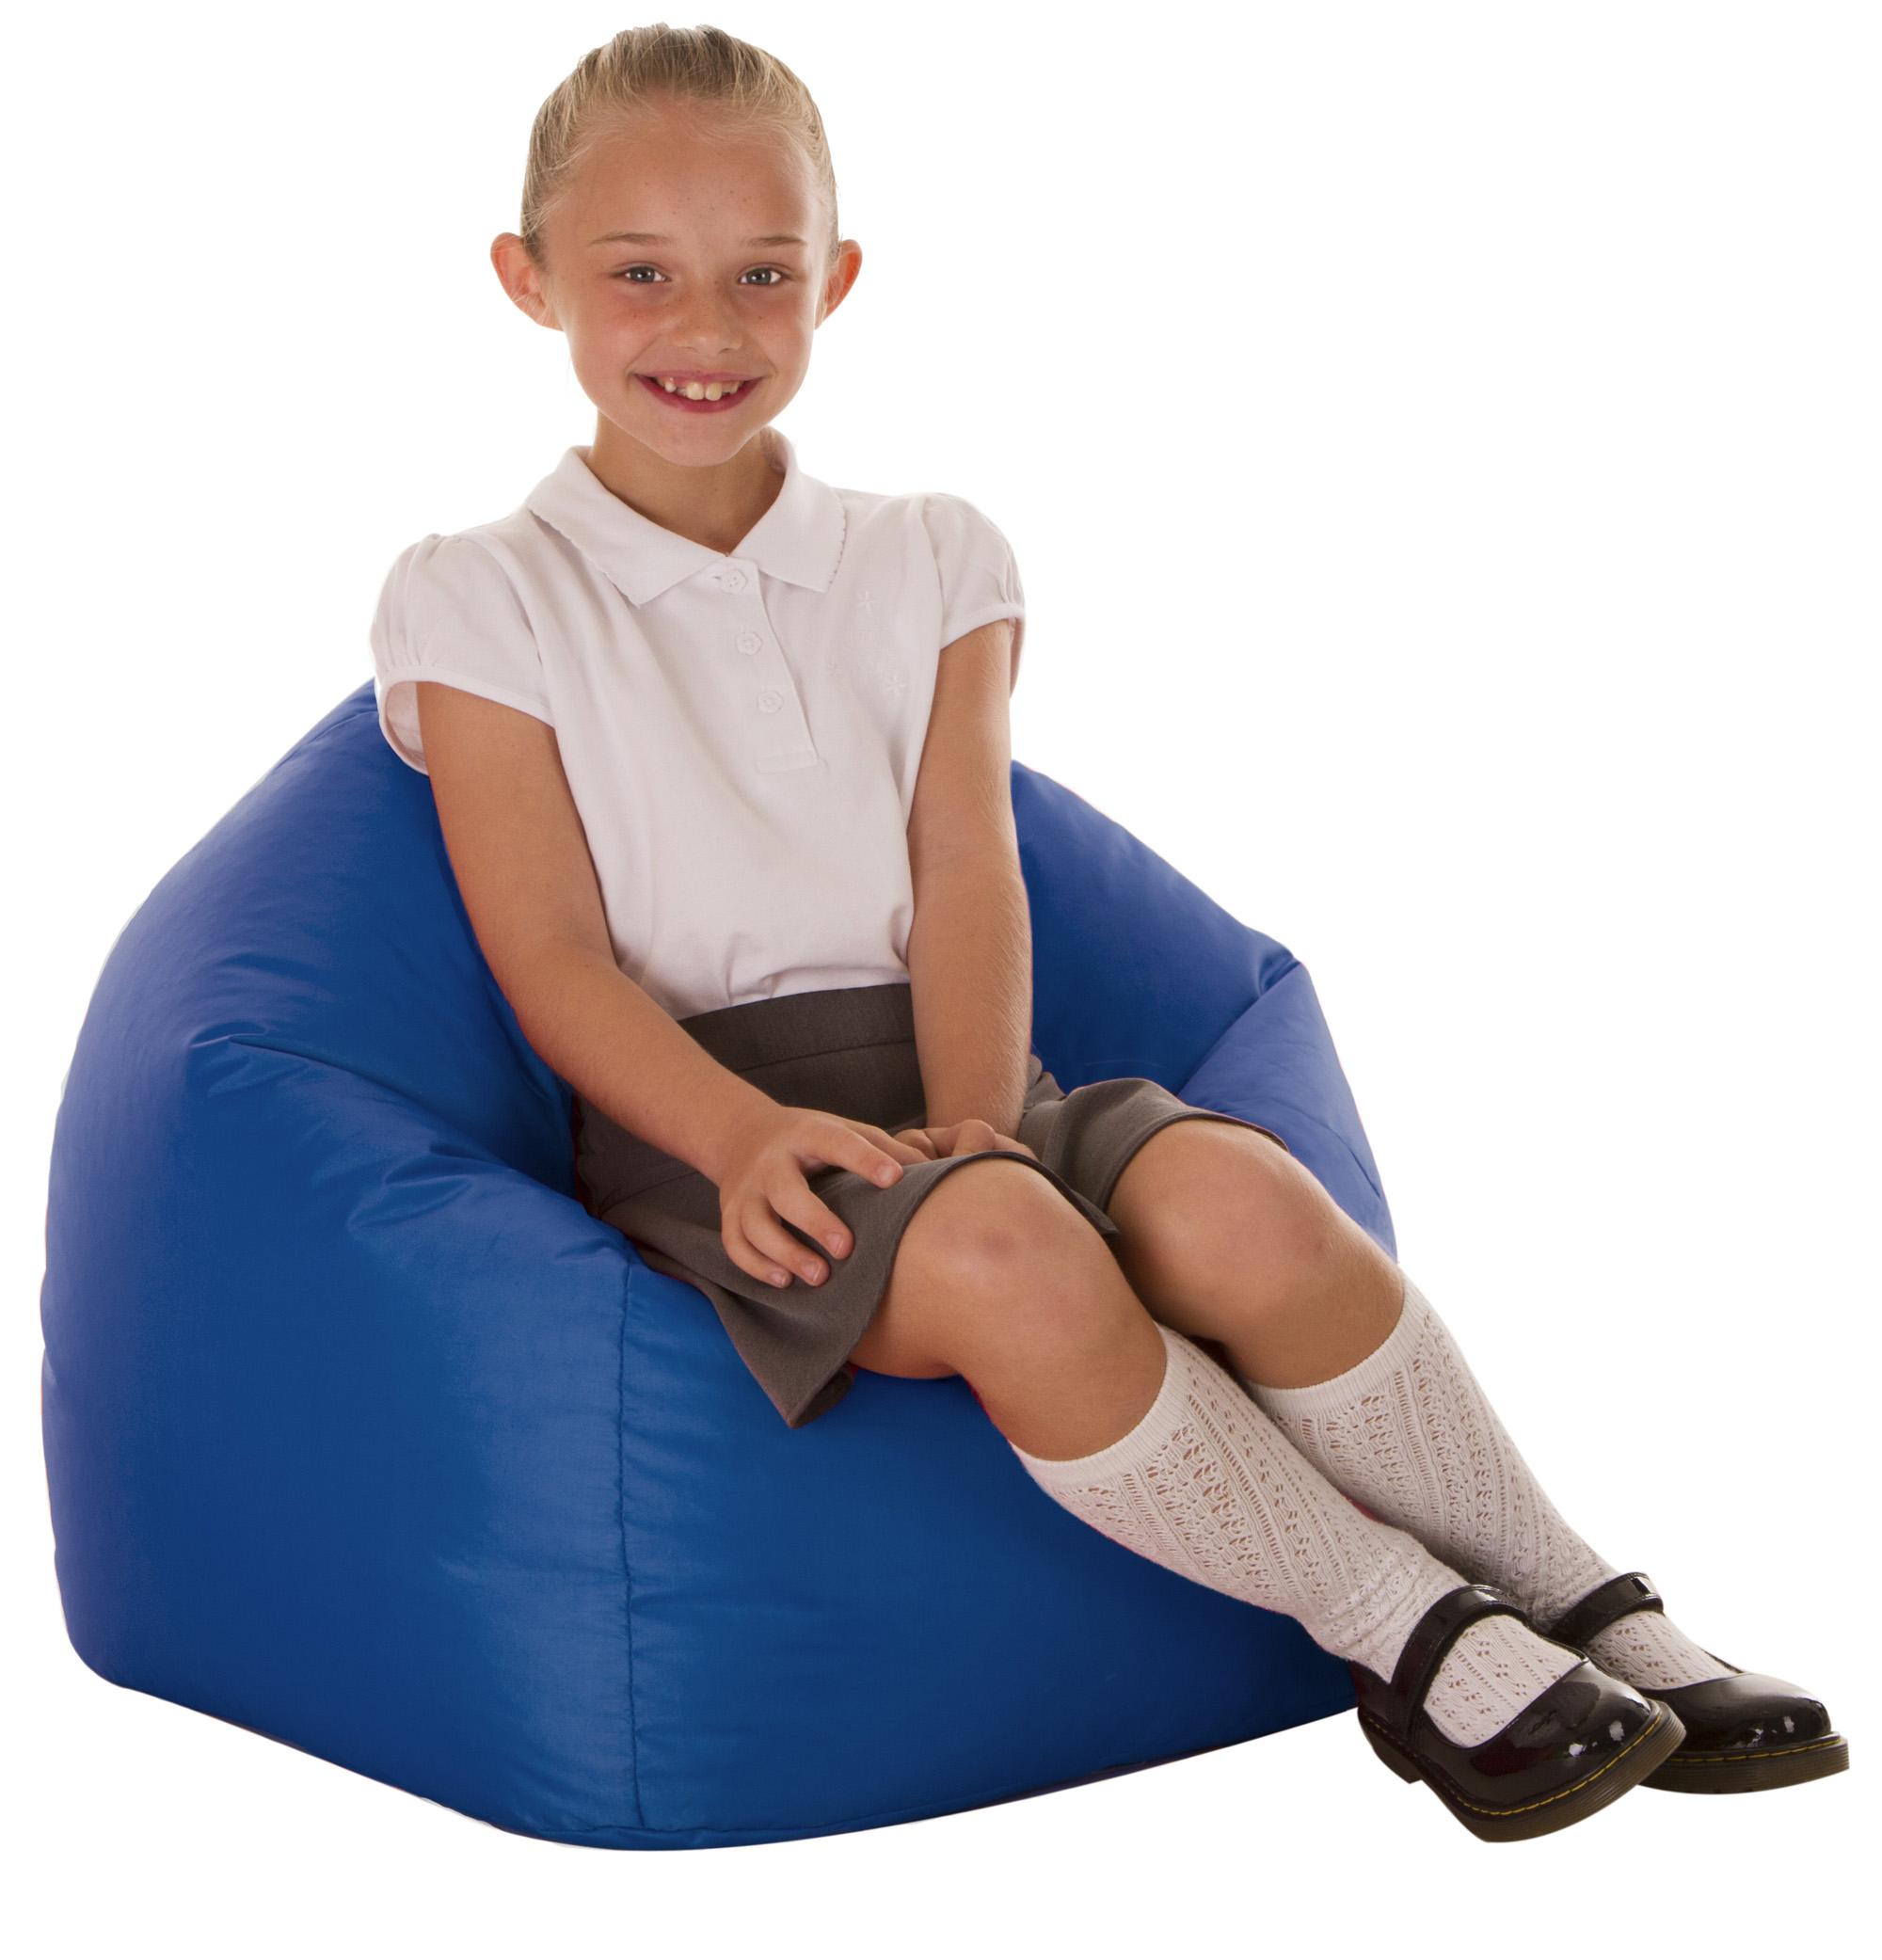 Eden-Primary-Bean-Bag-Blue-300dpi-2